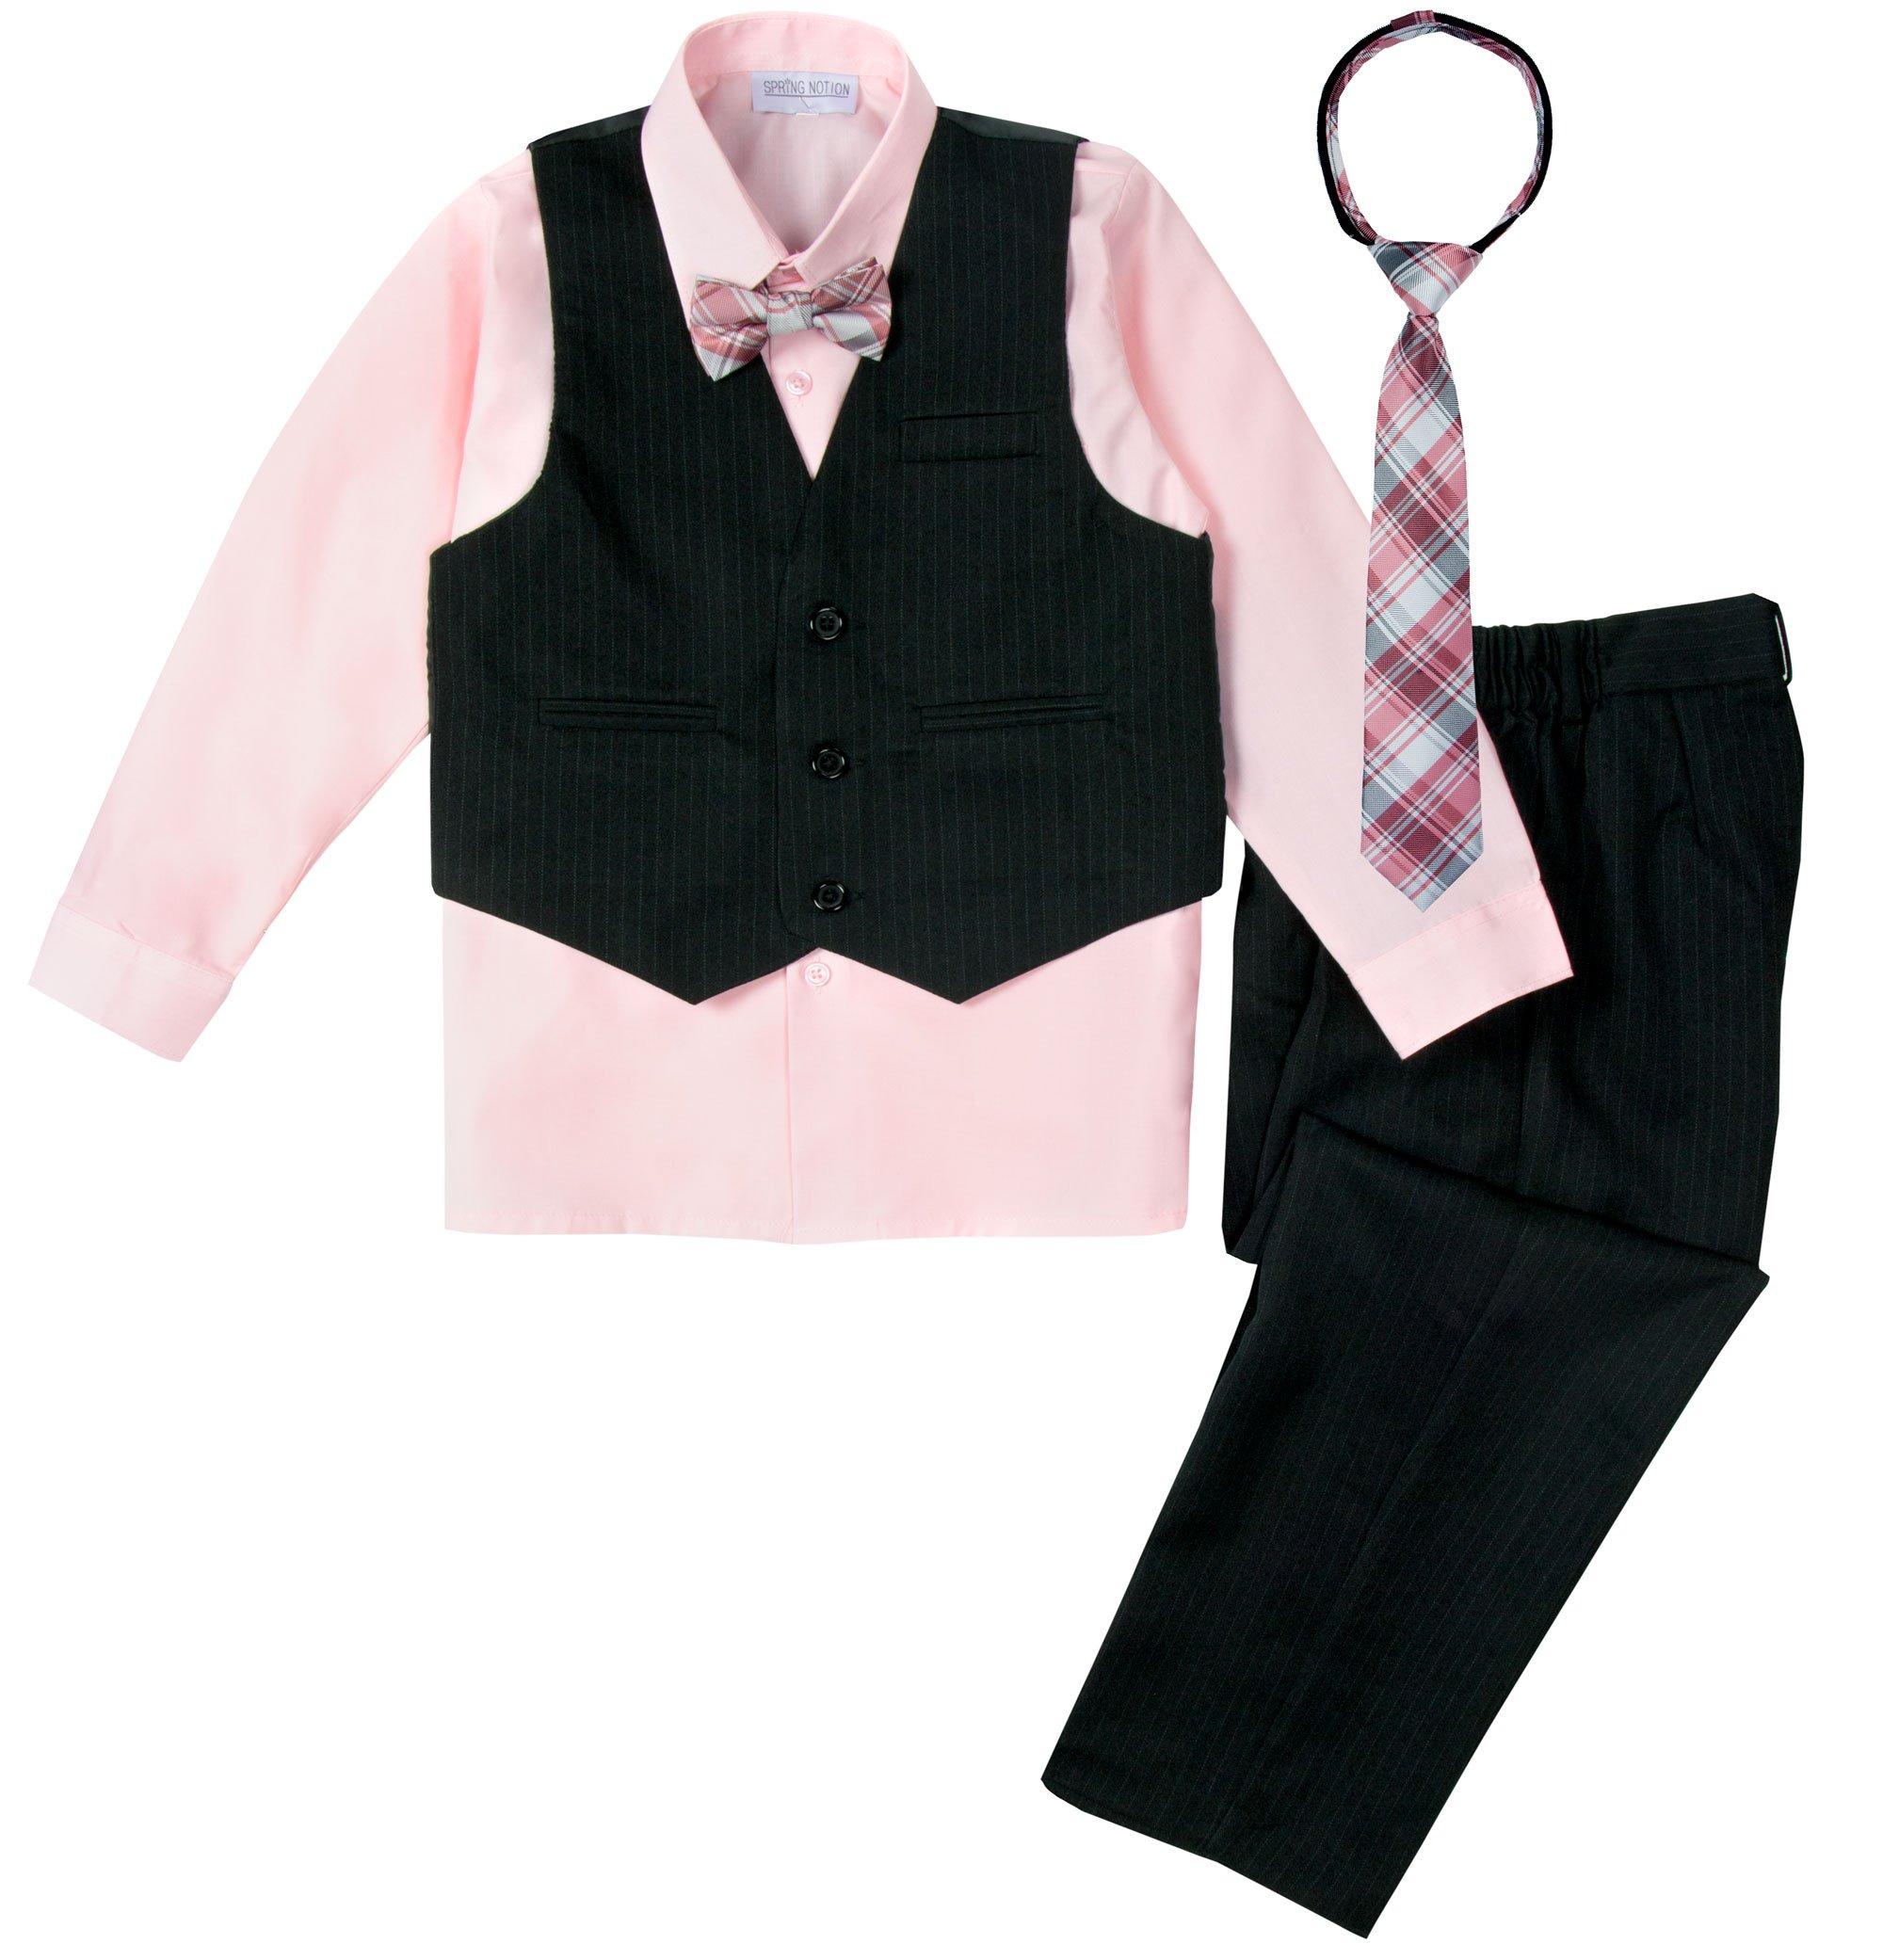 Spring Notion Big Boys' 5 Piece Pinstripe Vest Set Black-Pink-B 12